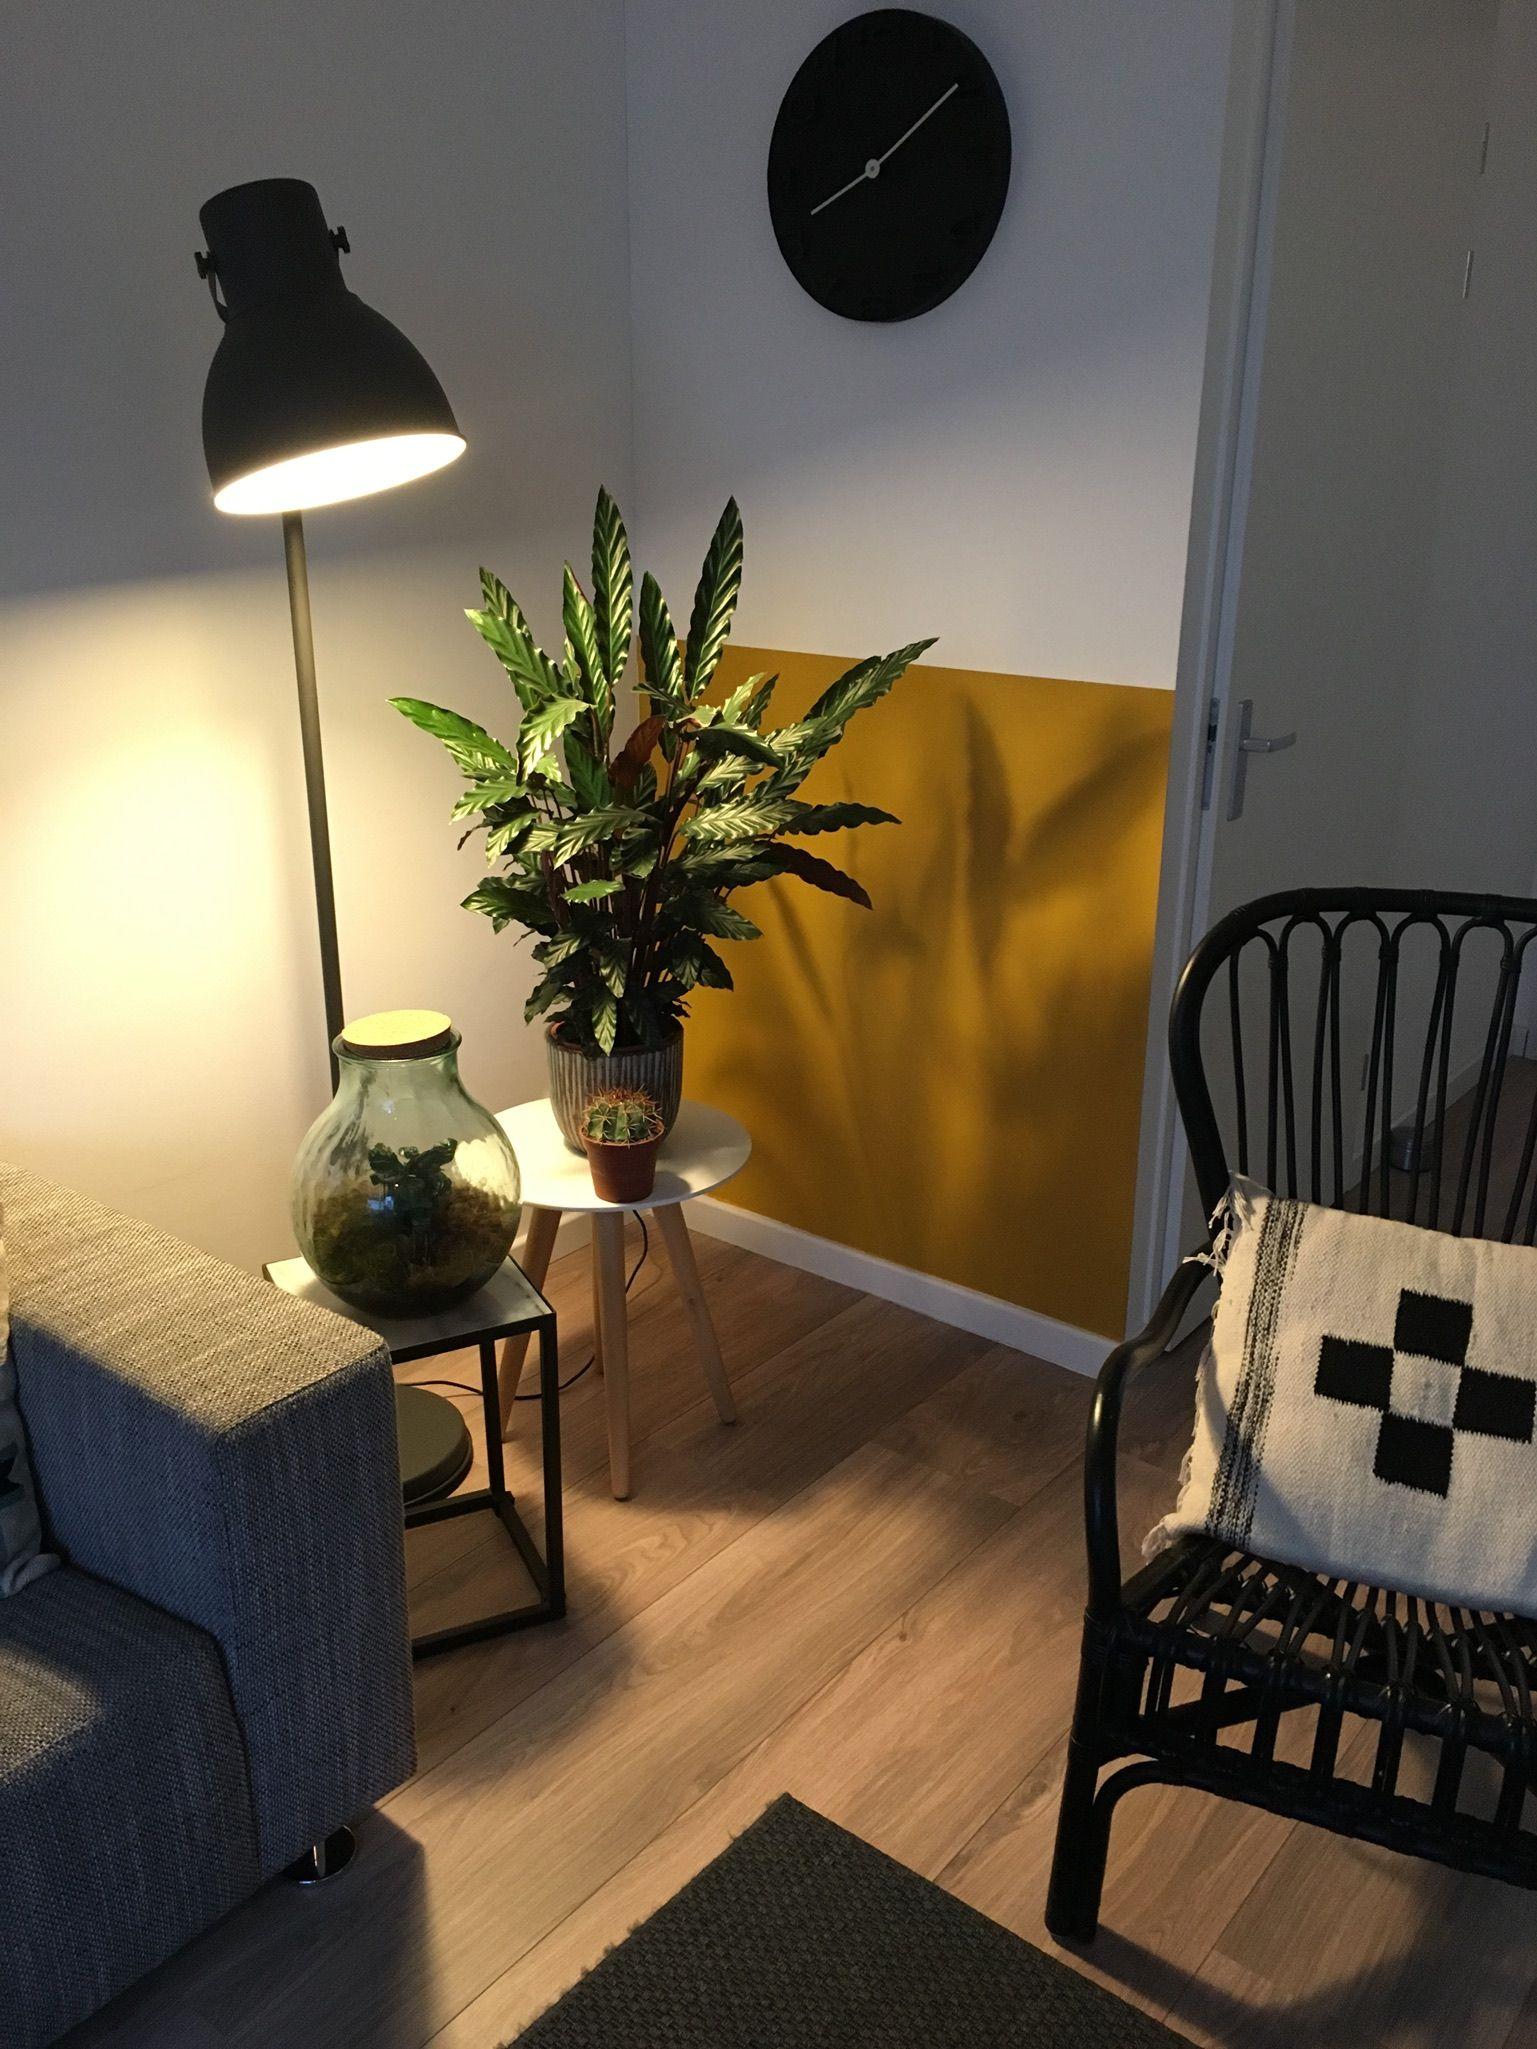 Okergeel muur woonkamer | zolder | Pinterest | Salons, Interiors and ...